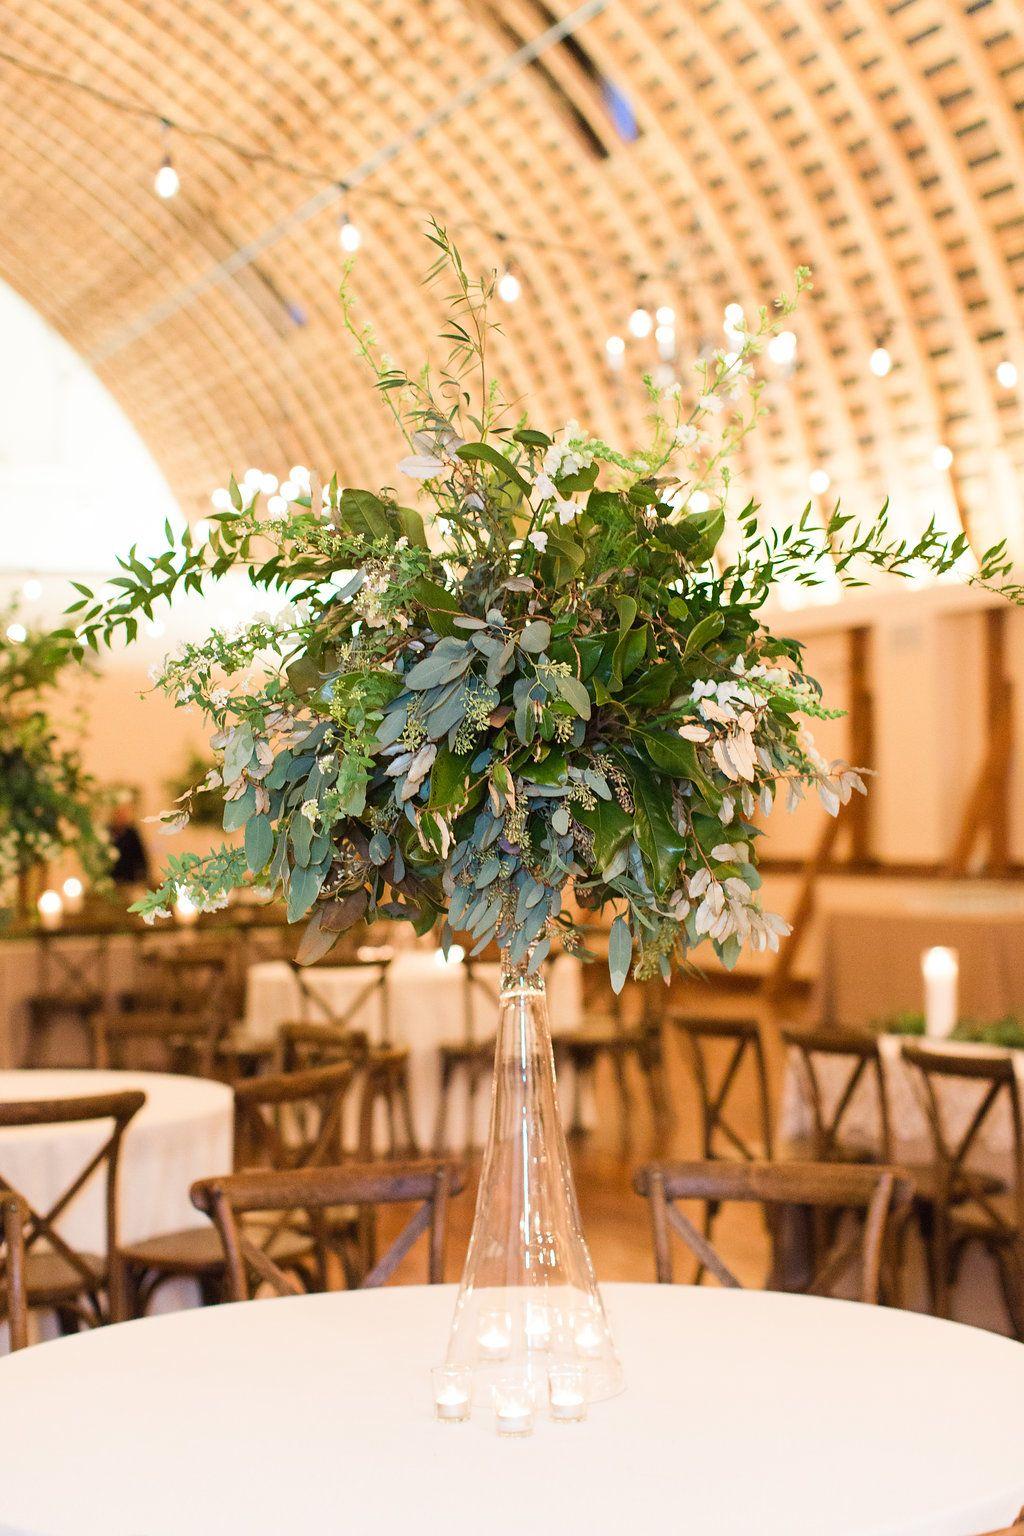 A Wedding With No Flowers Tanglewood Church And Winmock At Greensboro North CarolinaNorth